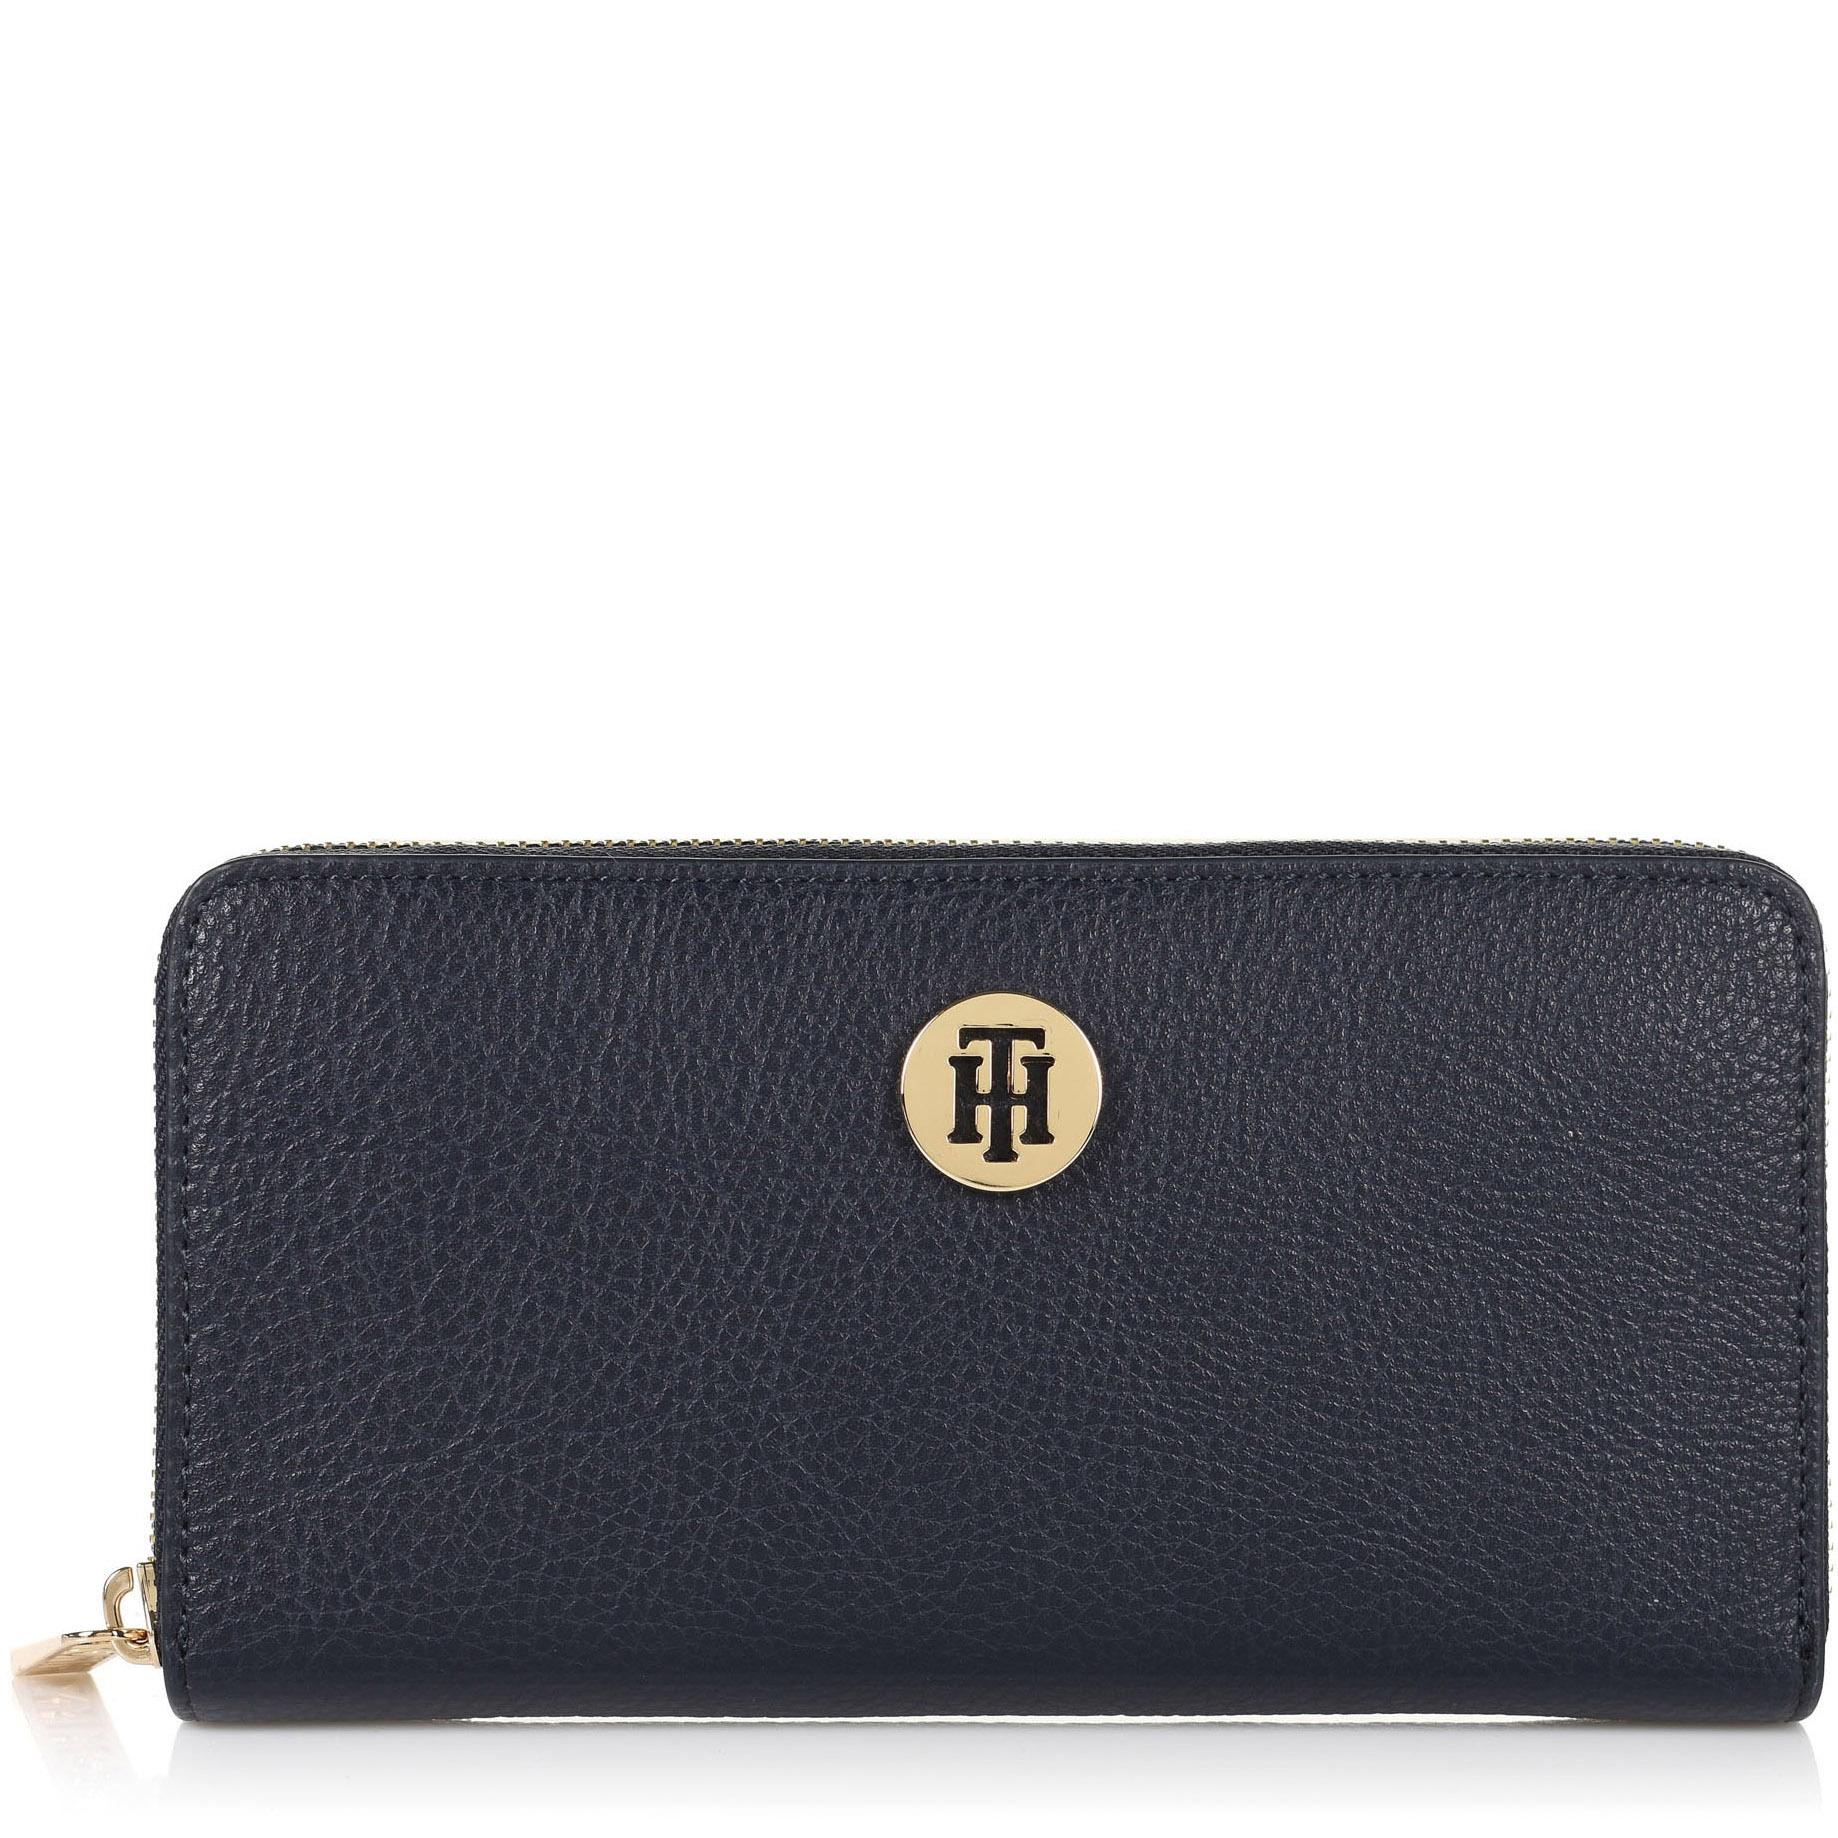 060d3392c723 Brandbags Πορτοφόλι Κασετίνα Tommy Hilfiger TH Core LRG AW0AW06500